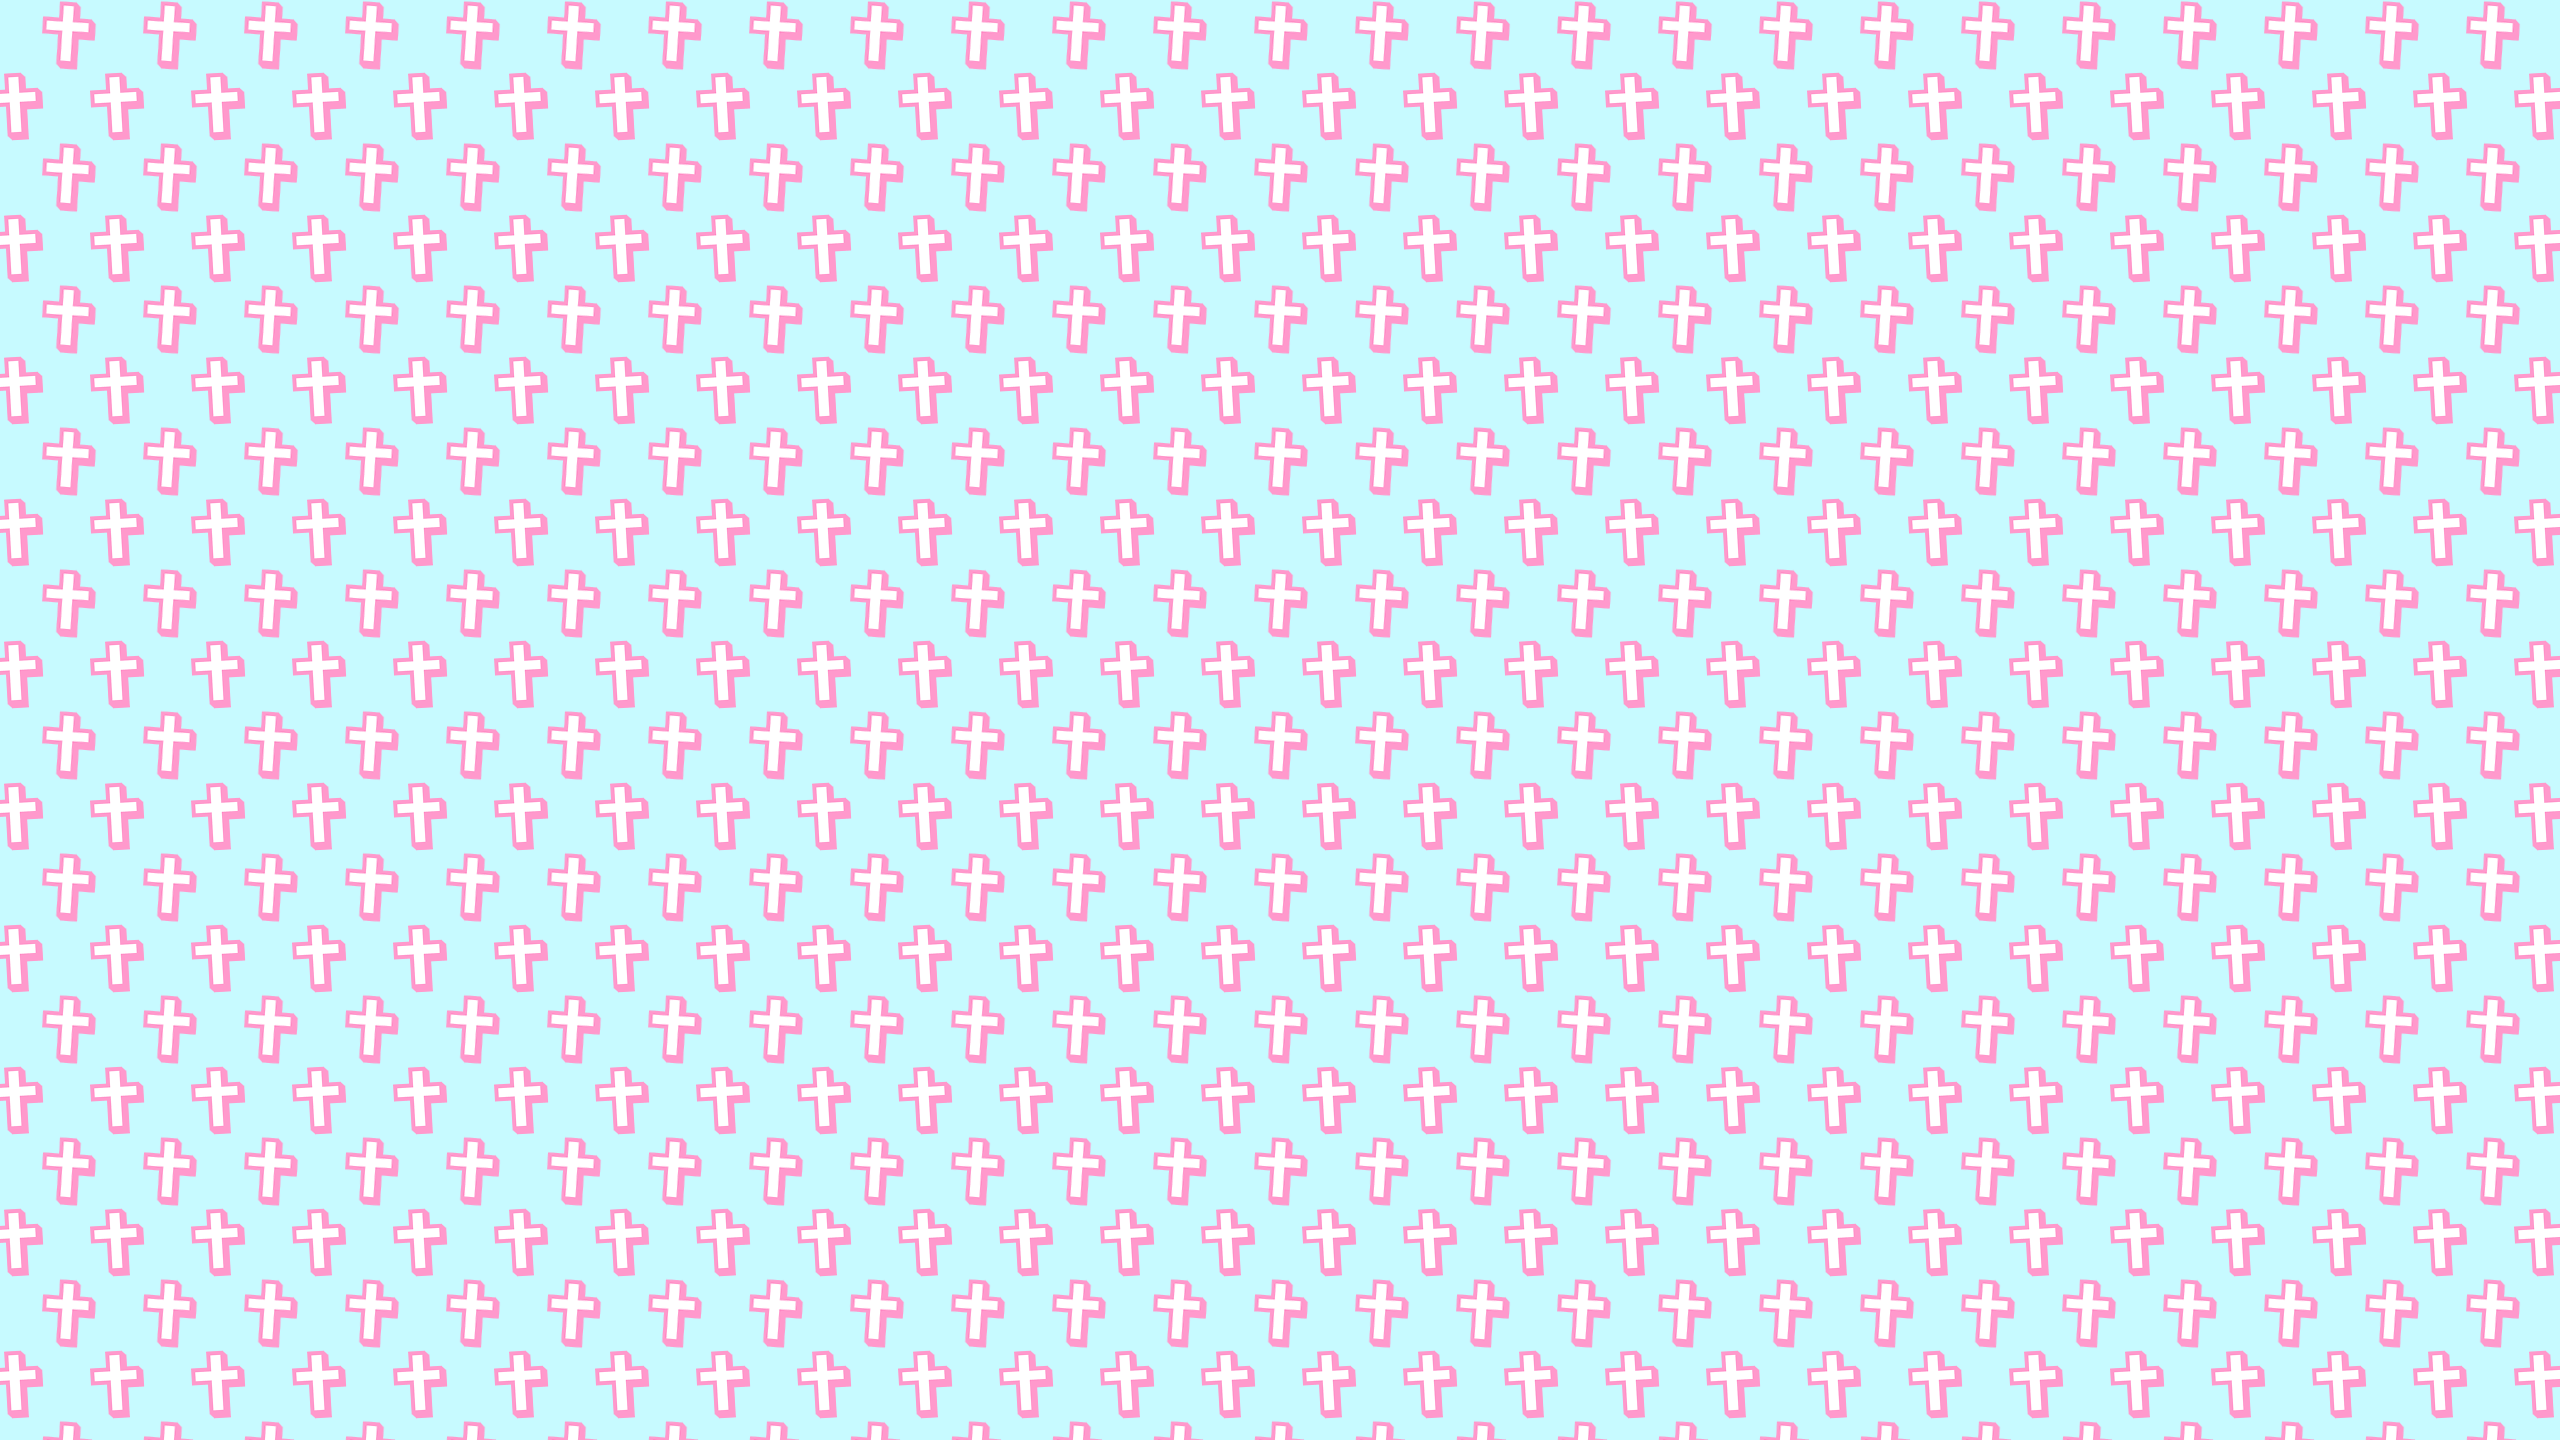 Cute Crosses Background Wallpaper Desktop Wallpapers 2560x1440